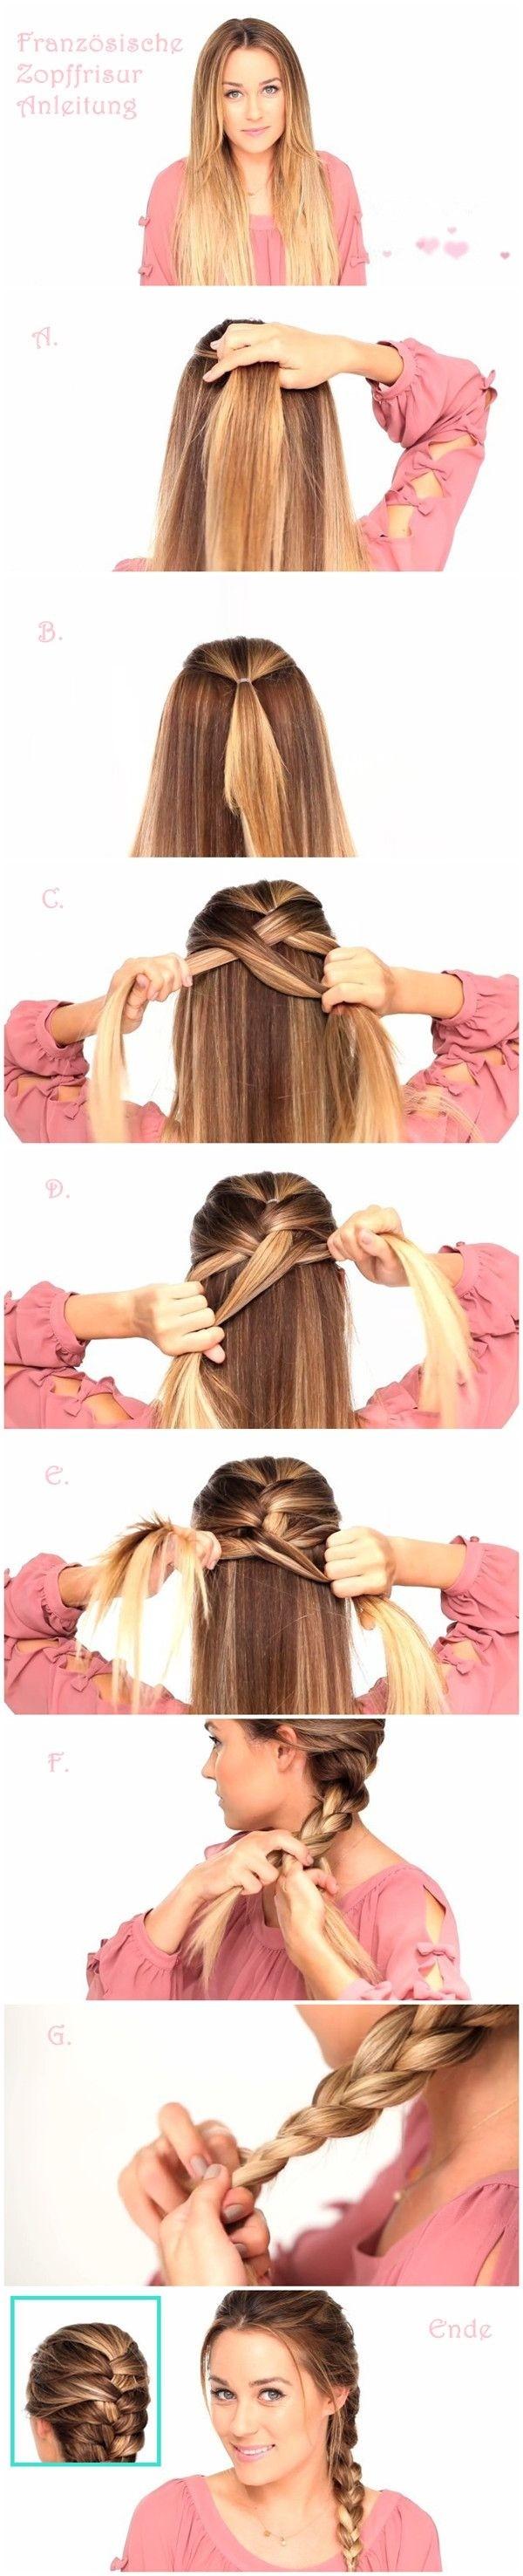 Strange 10 French Braids Hairstyles Tutorials Everyday Hair Styles Short Hairstyles Gunalazisus